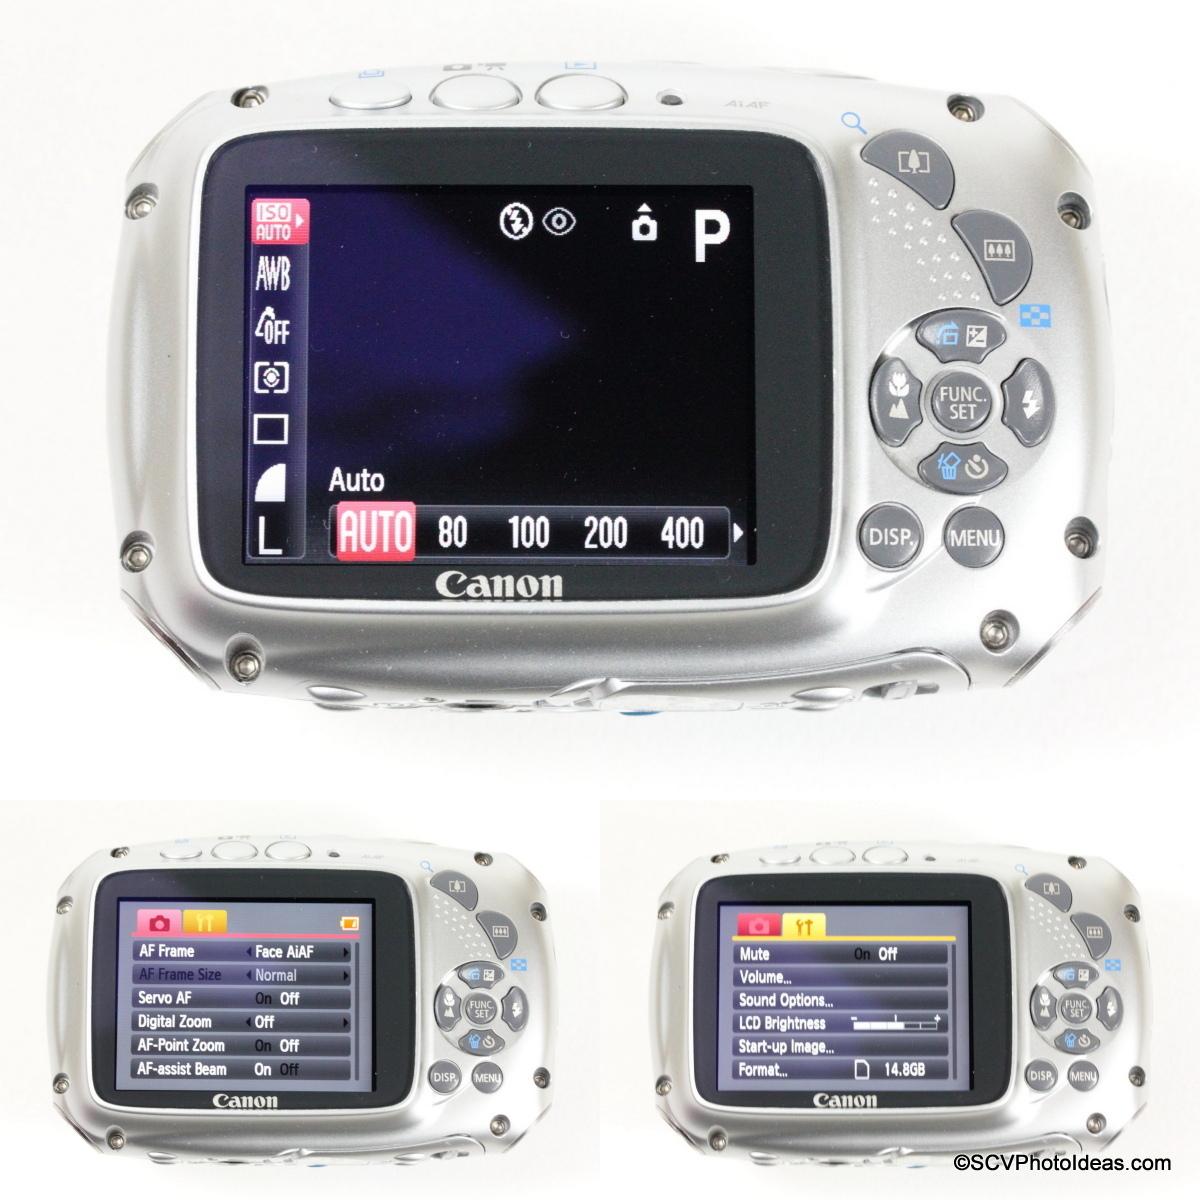 Canon PowerShot D10 Camera Program and Menus